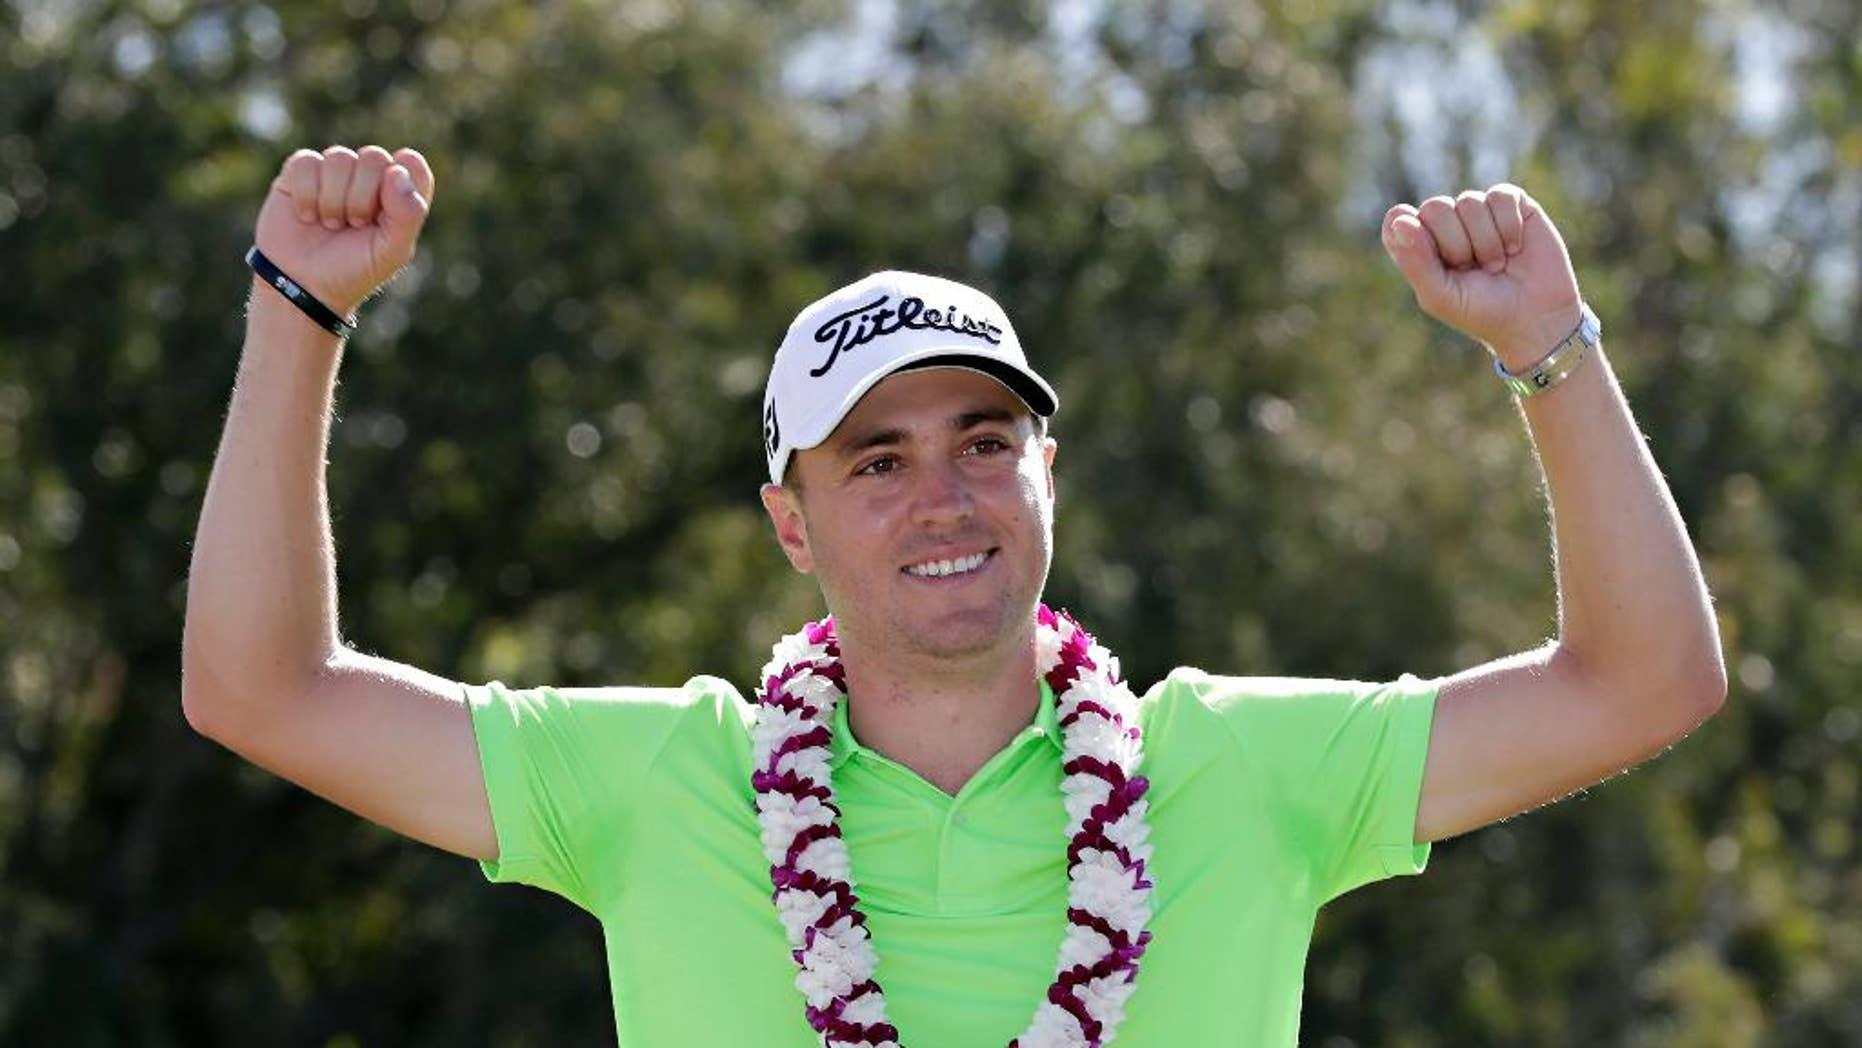 Justin Thomas celebrates after the final round of the Tournament of Champions golf event, Sunday, Jan. 8, 2017, at Kapalua Plantation Course in Kapalua, Hawaii. (AP Photo/Matt York)